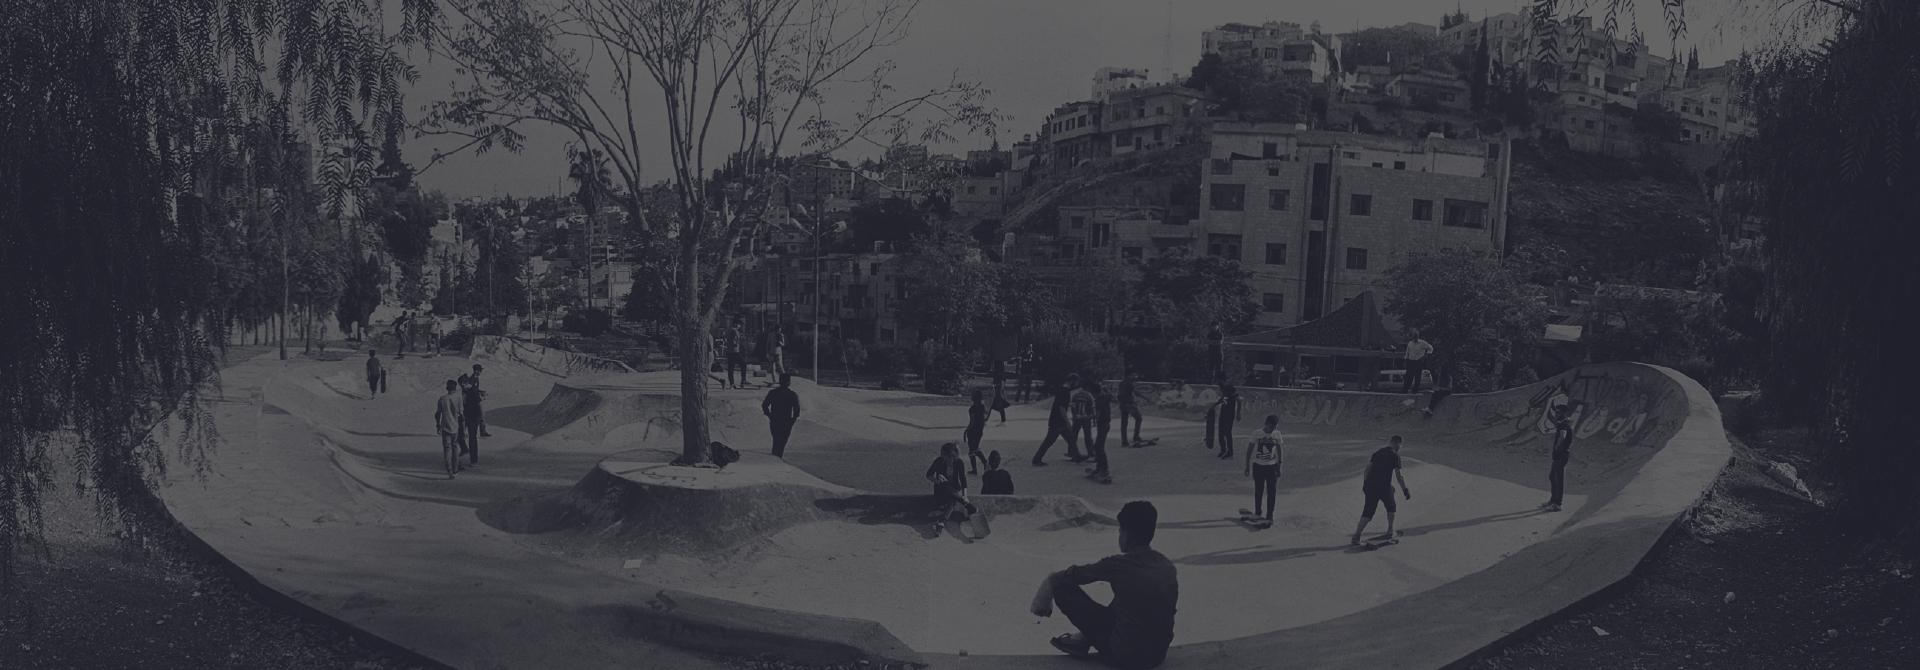 01 Urban Park Feature